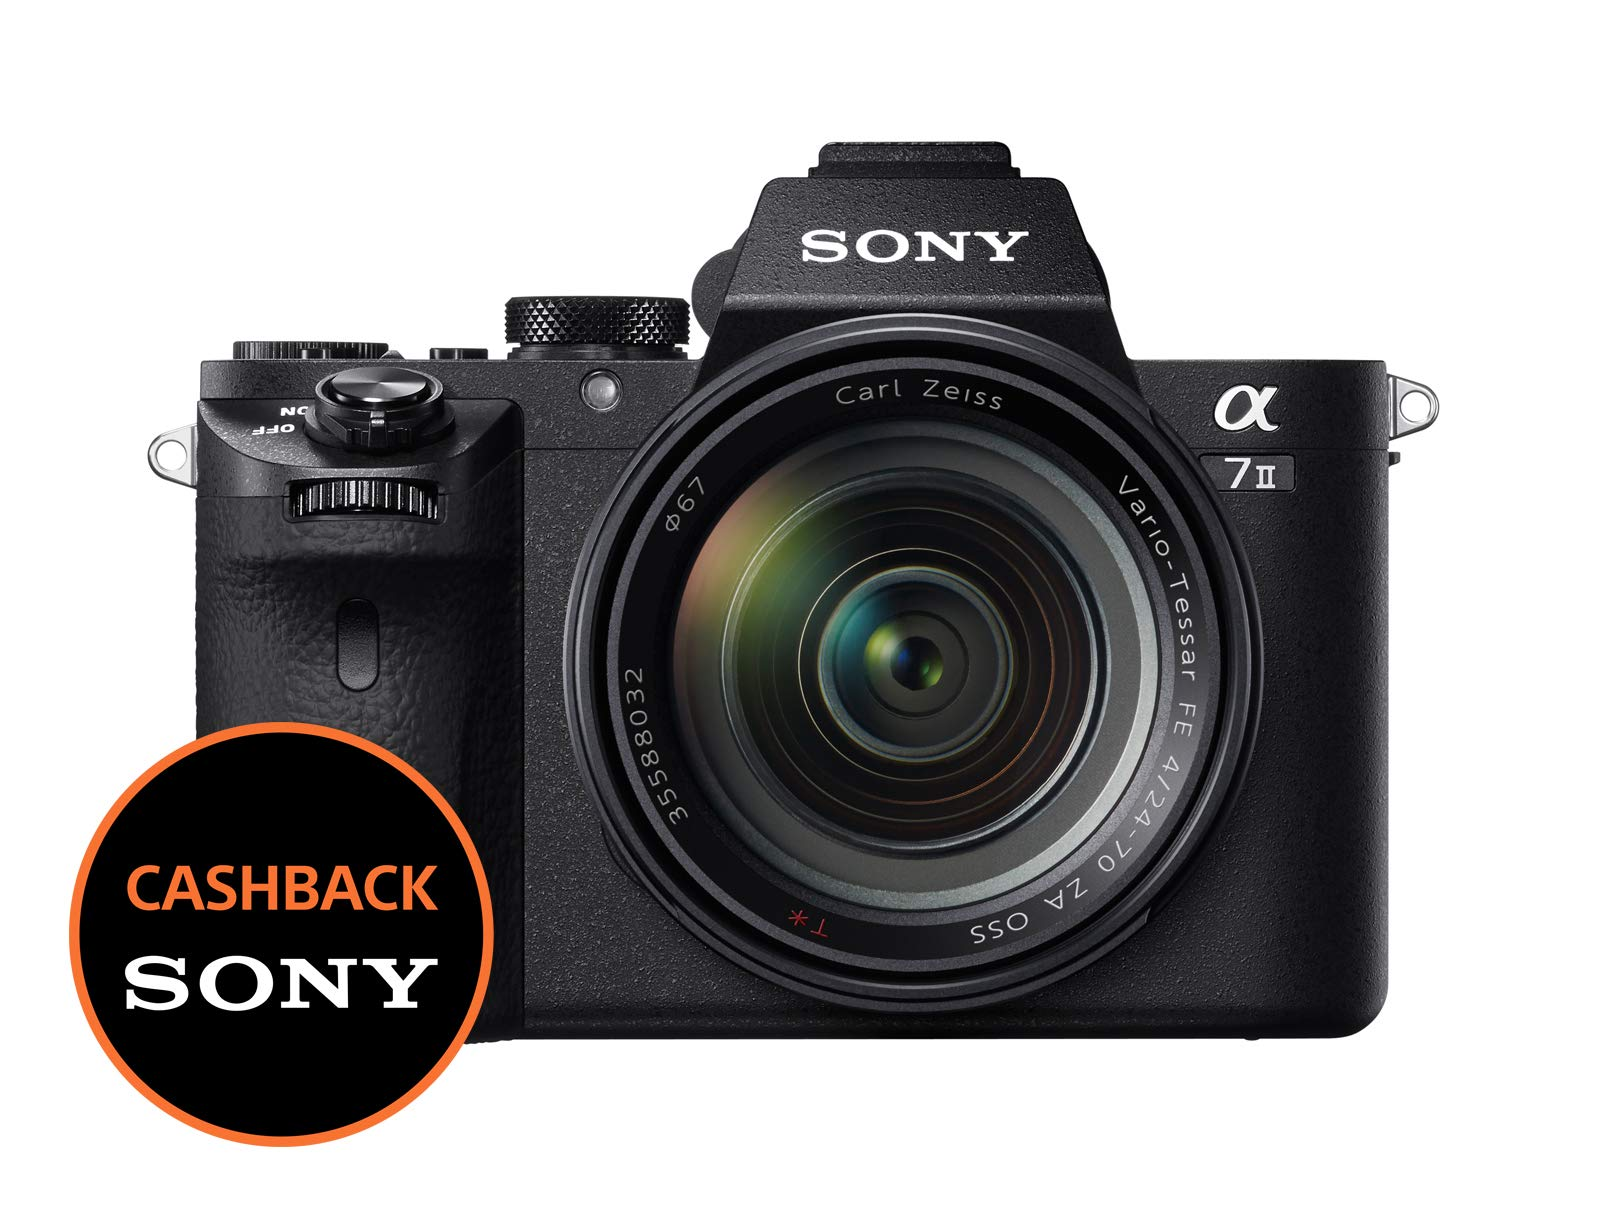 Sony ILCE-7M2Alpha 7II Fotocamera Digitale (24,3Mega Pixel, Display LCD da 7,62cm (3pollici), Full HD Video Funzione (xavc S, AVCHD), sensore CMOS Exmor Full-Frame) product image